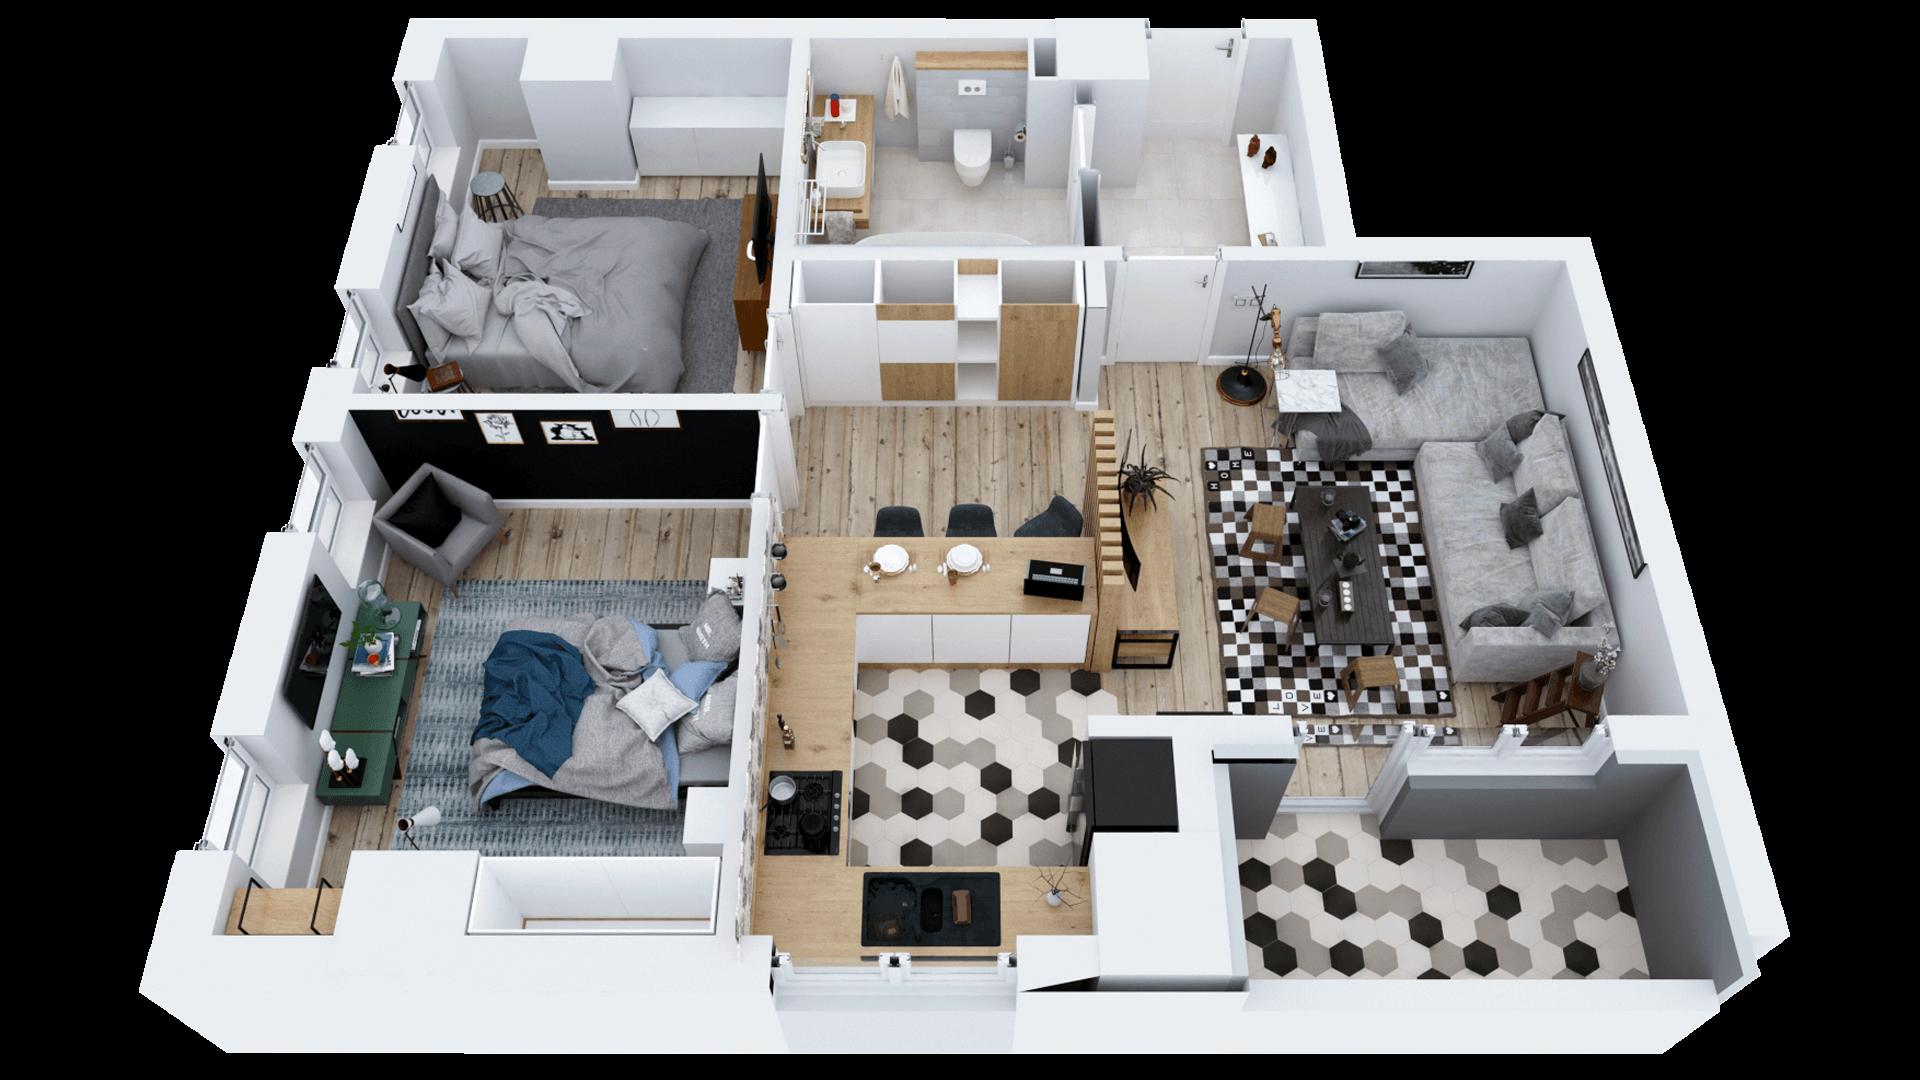 https://solumnia.ro/wp-content/uploads/2019/02/Solumnia_apartamente_noi_iasi_rate_la_dezvoltator_apartament_3_camere_tip_3a-3.png